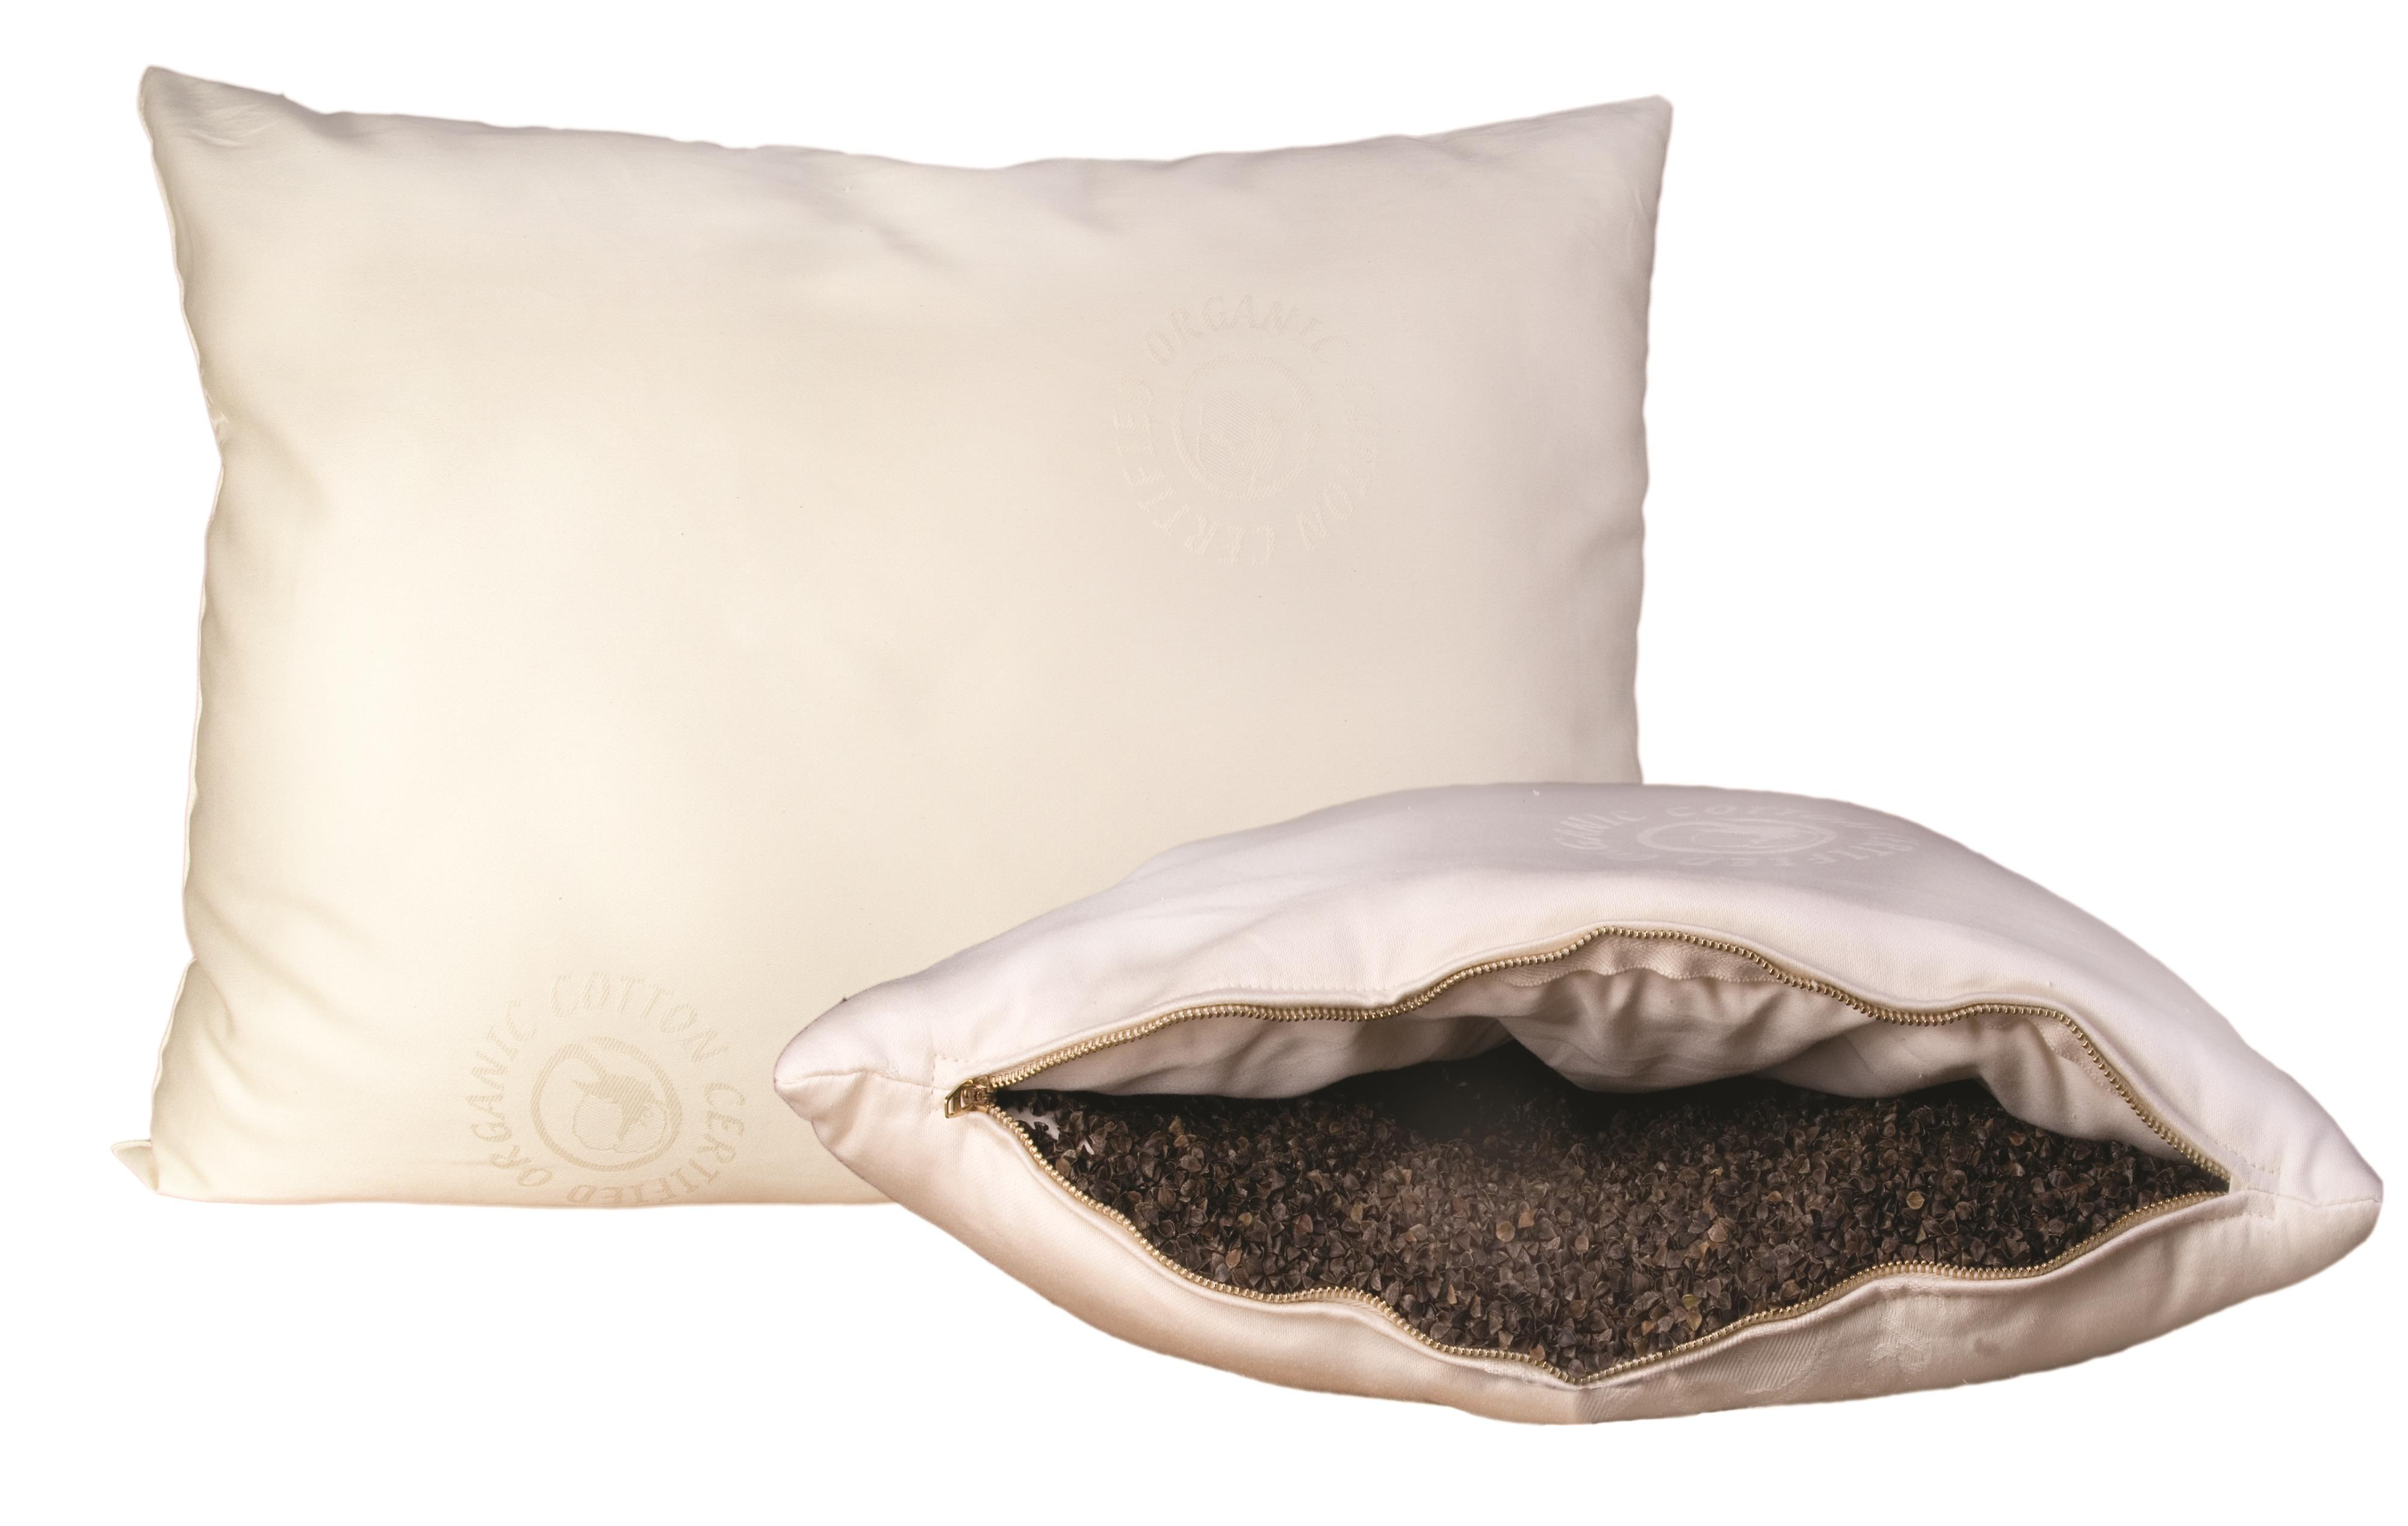 Organic Mattresses, Inc. (OMI) Buckwheat Pillows Queen Wool-Wrapped Buckwheat Pillow - Item Number: 30WBP-0